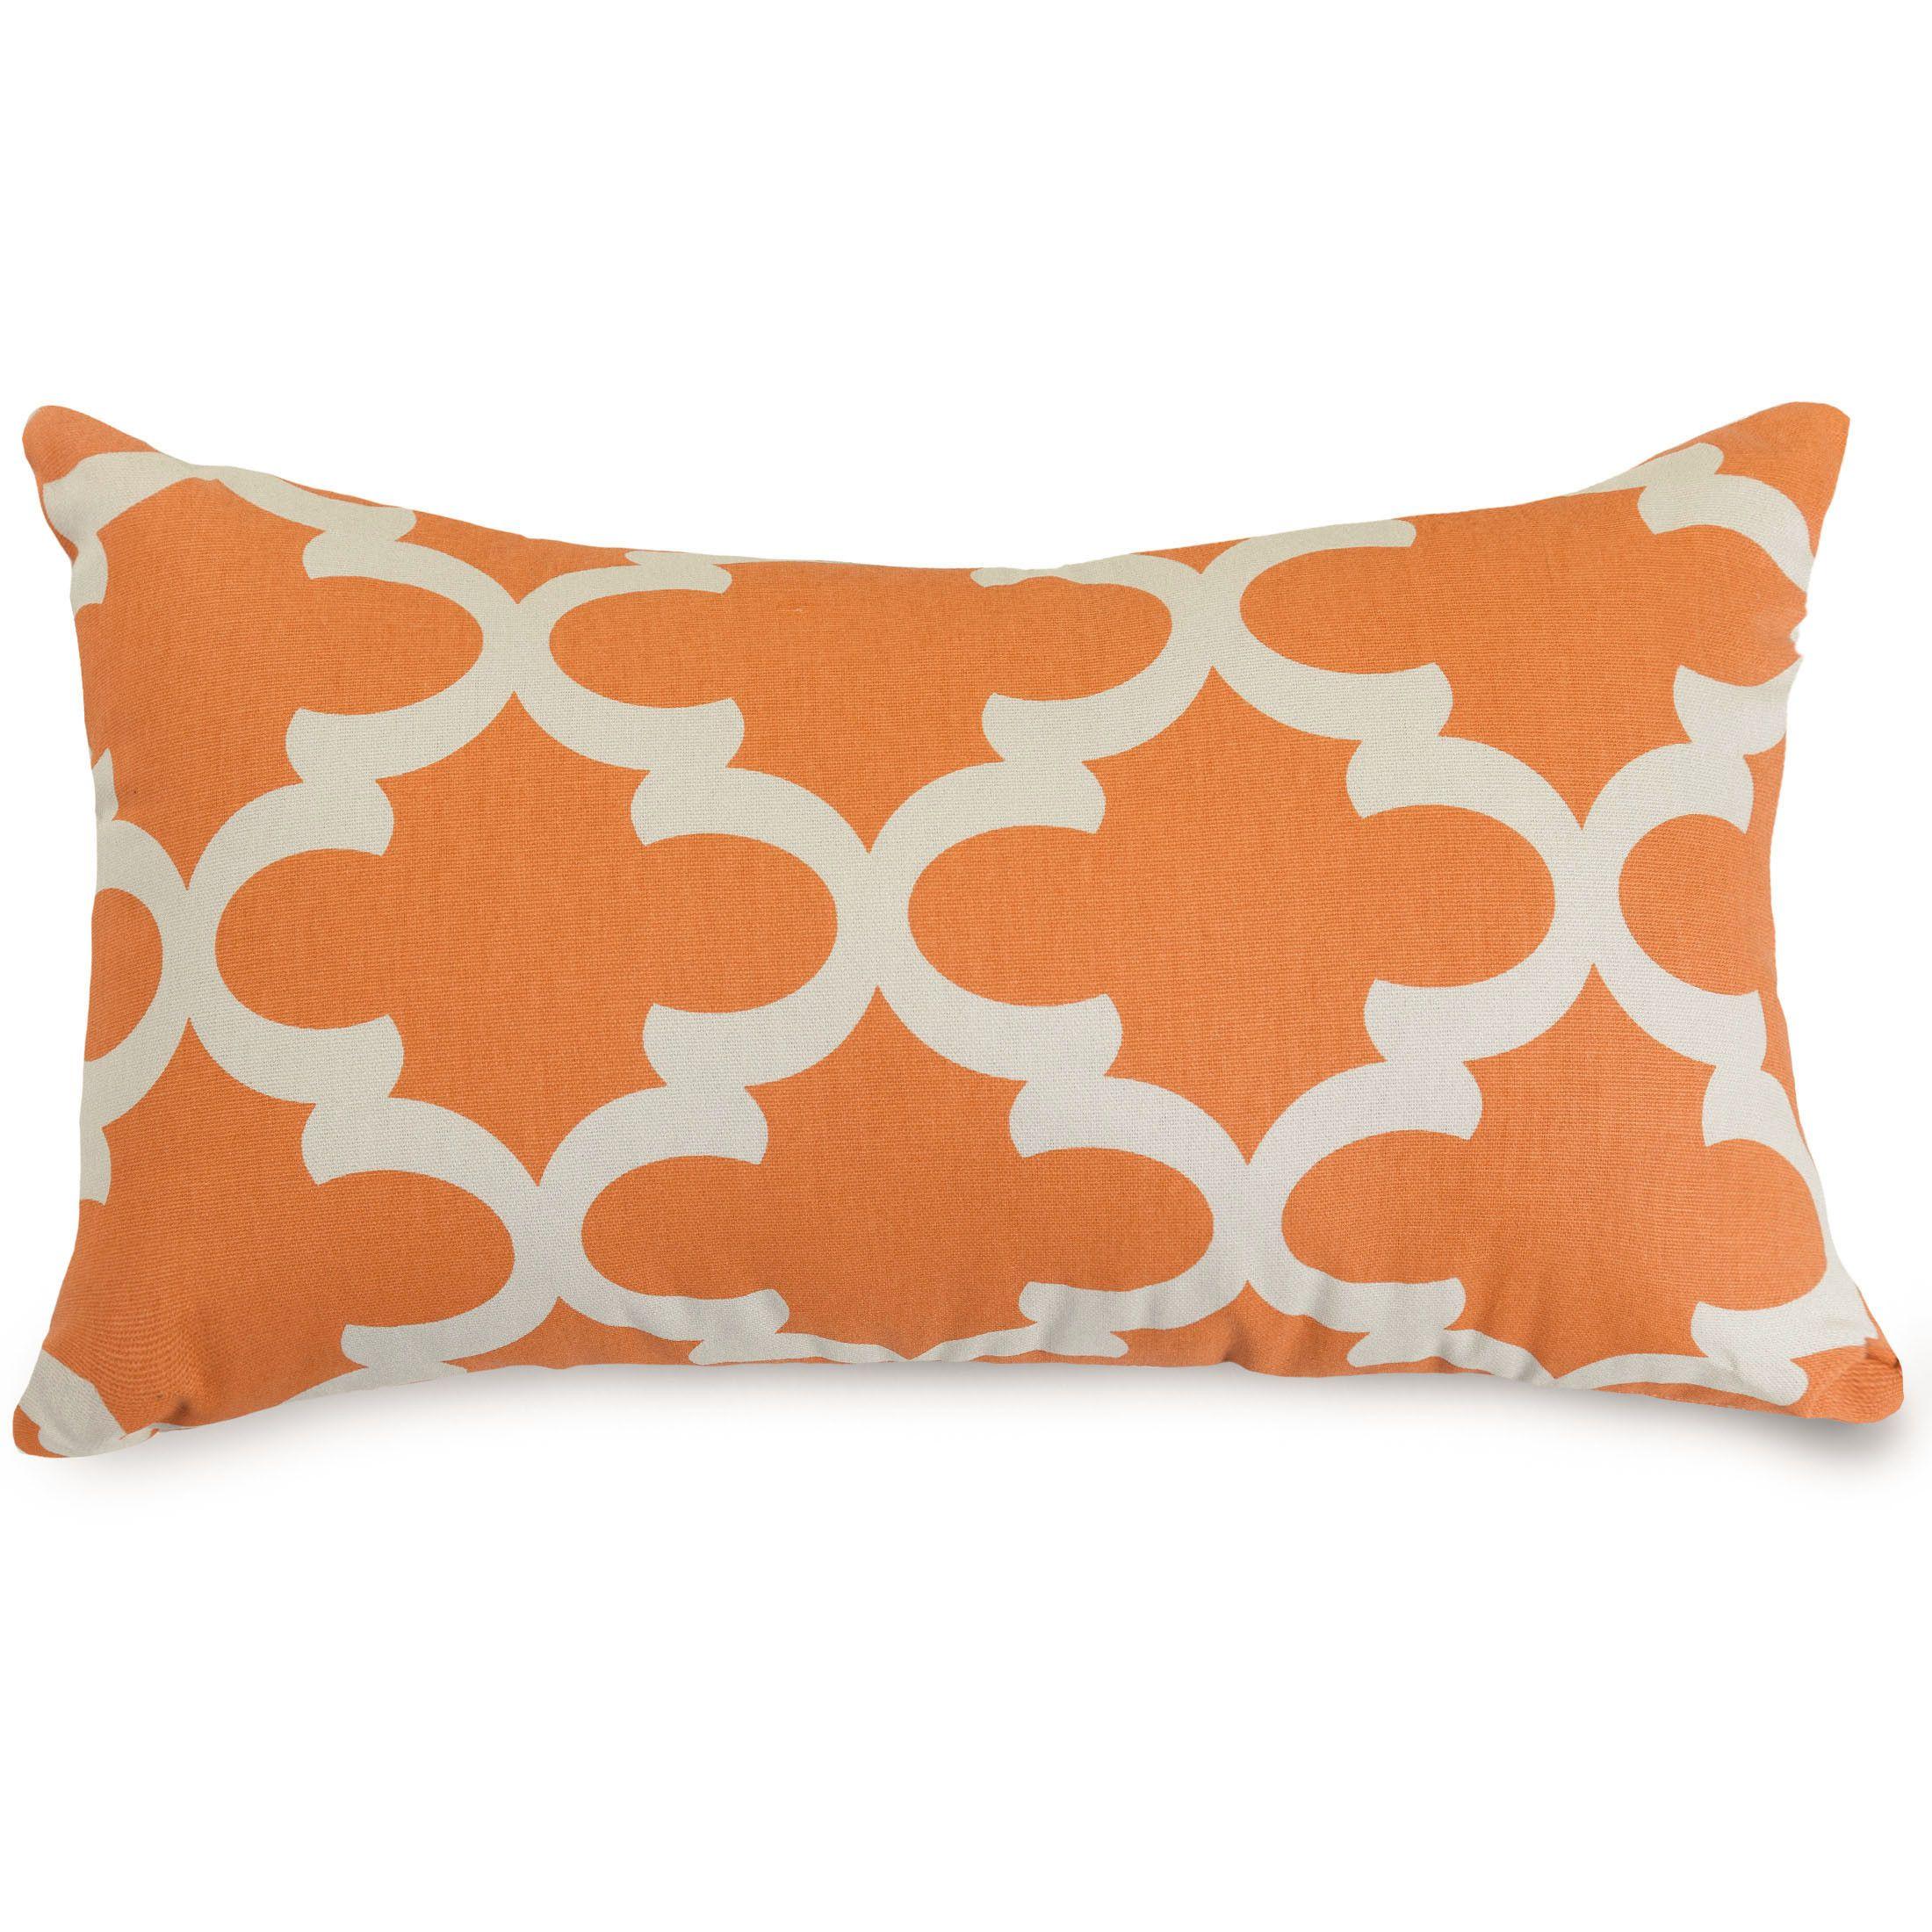 com decor goods pioneerproduceofnorthpole home pillow walmart sale pillows festive